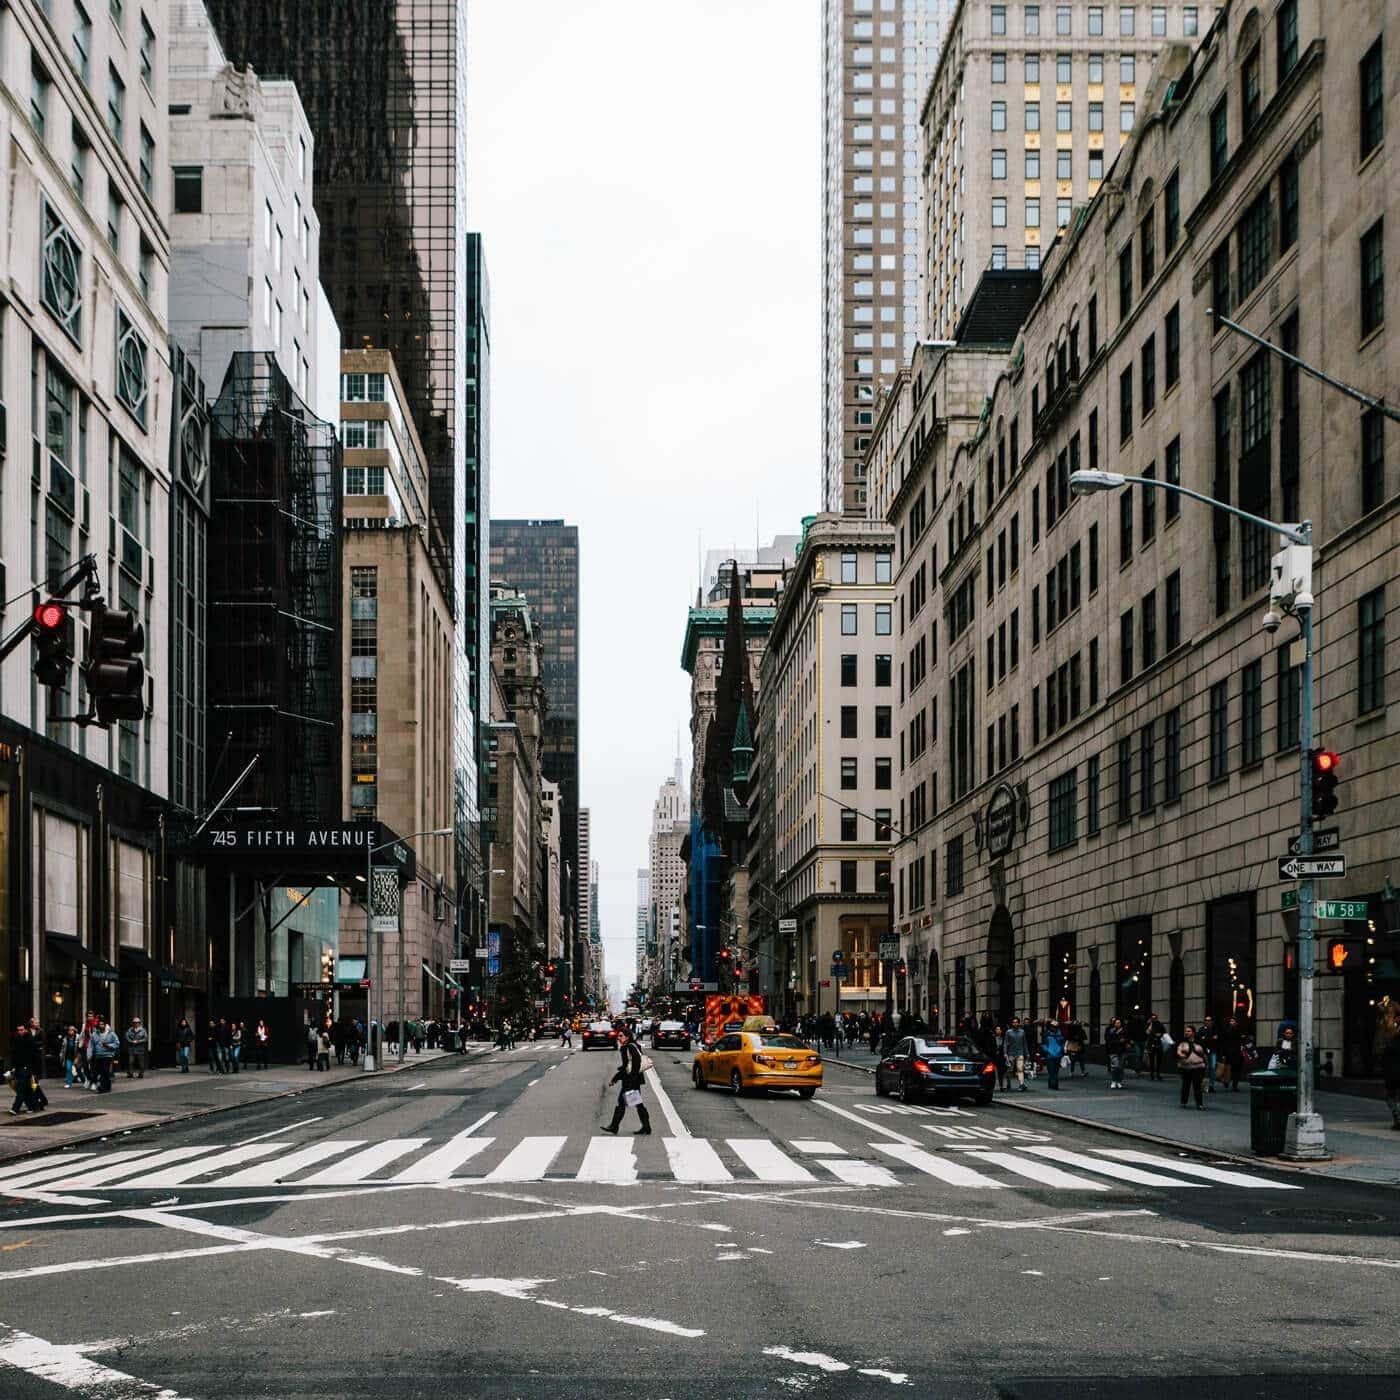 new-york-fotografie-5th-avenue